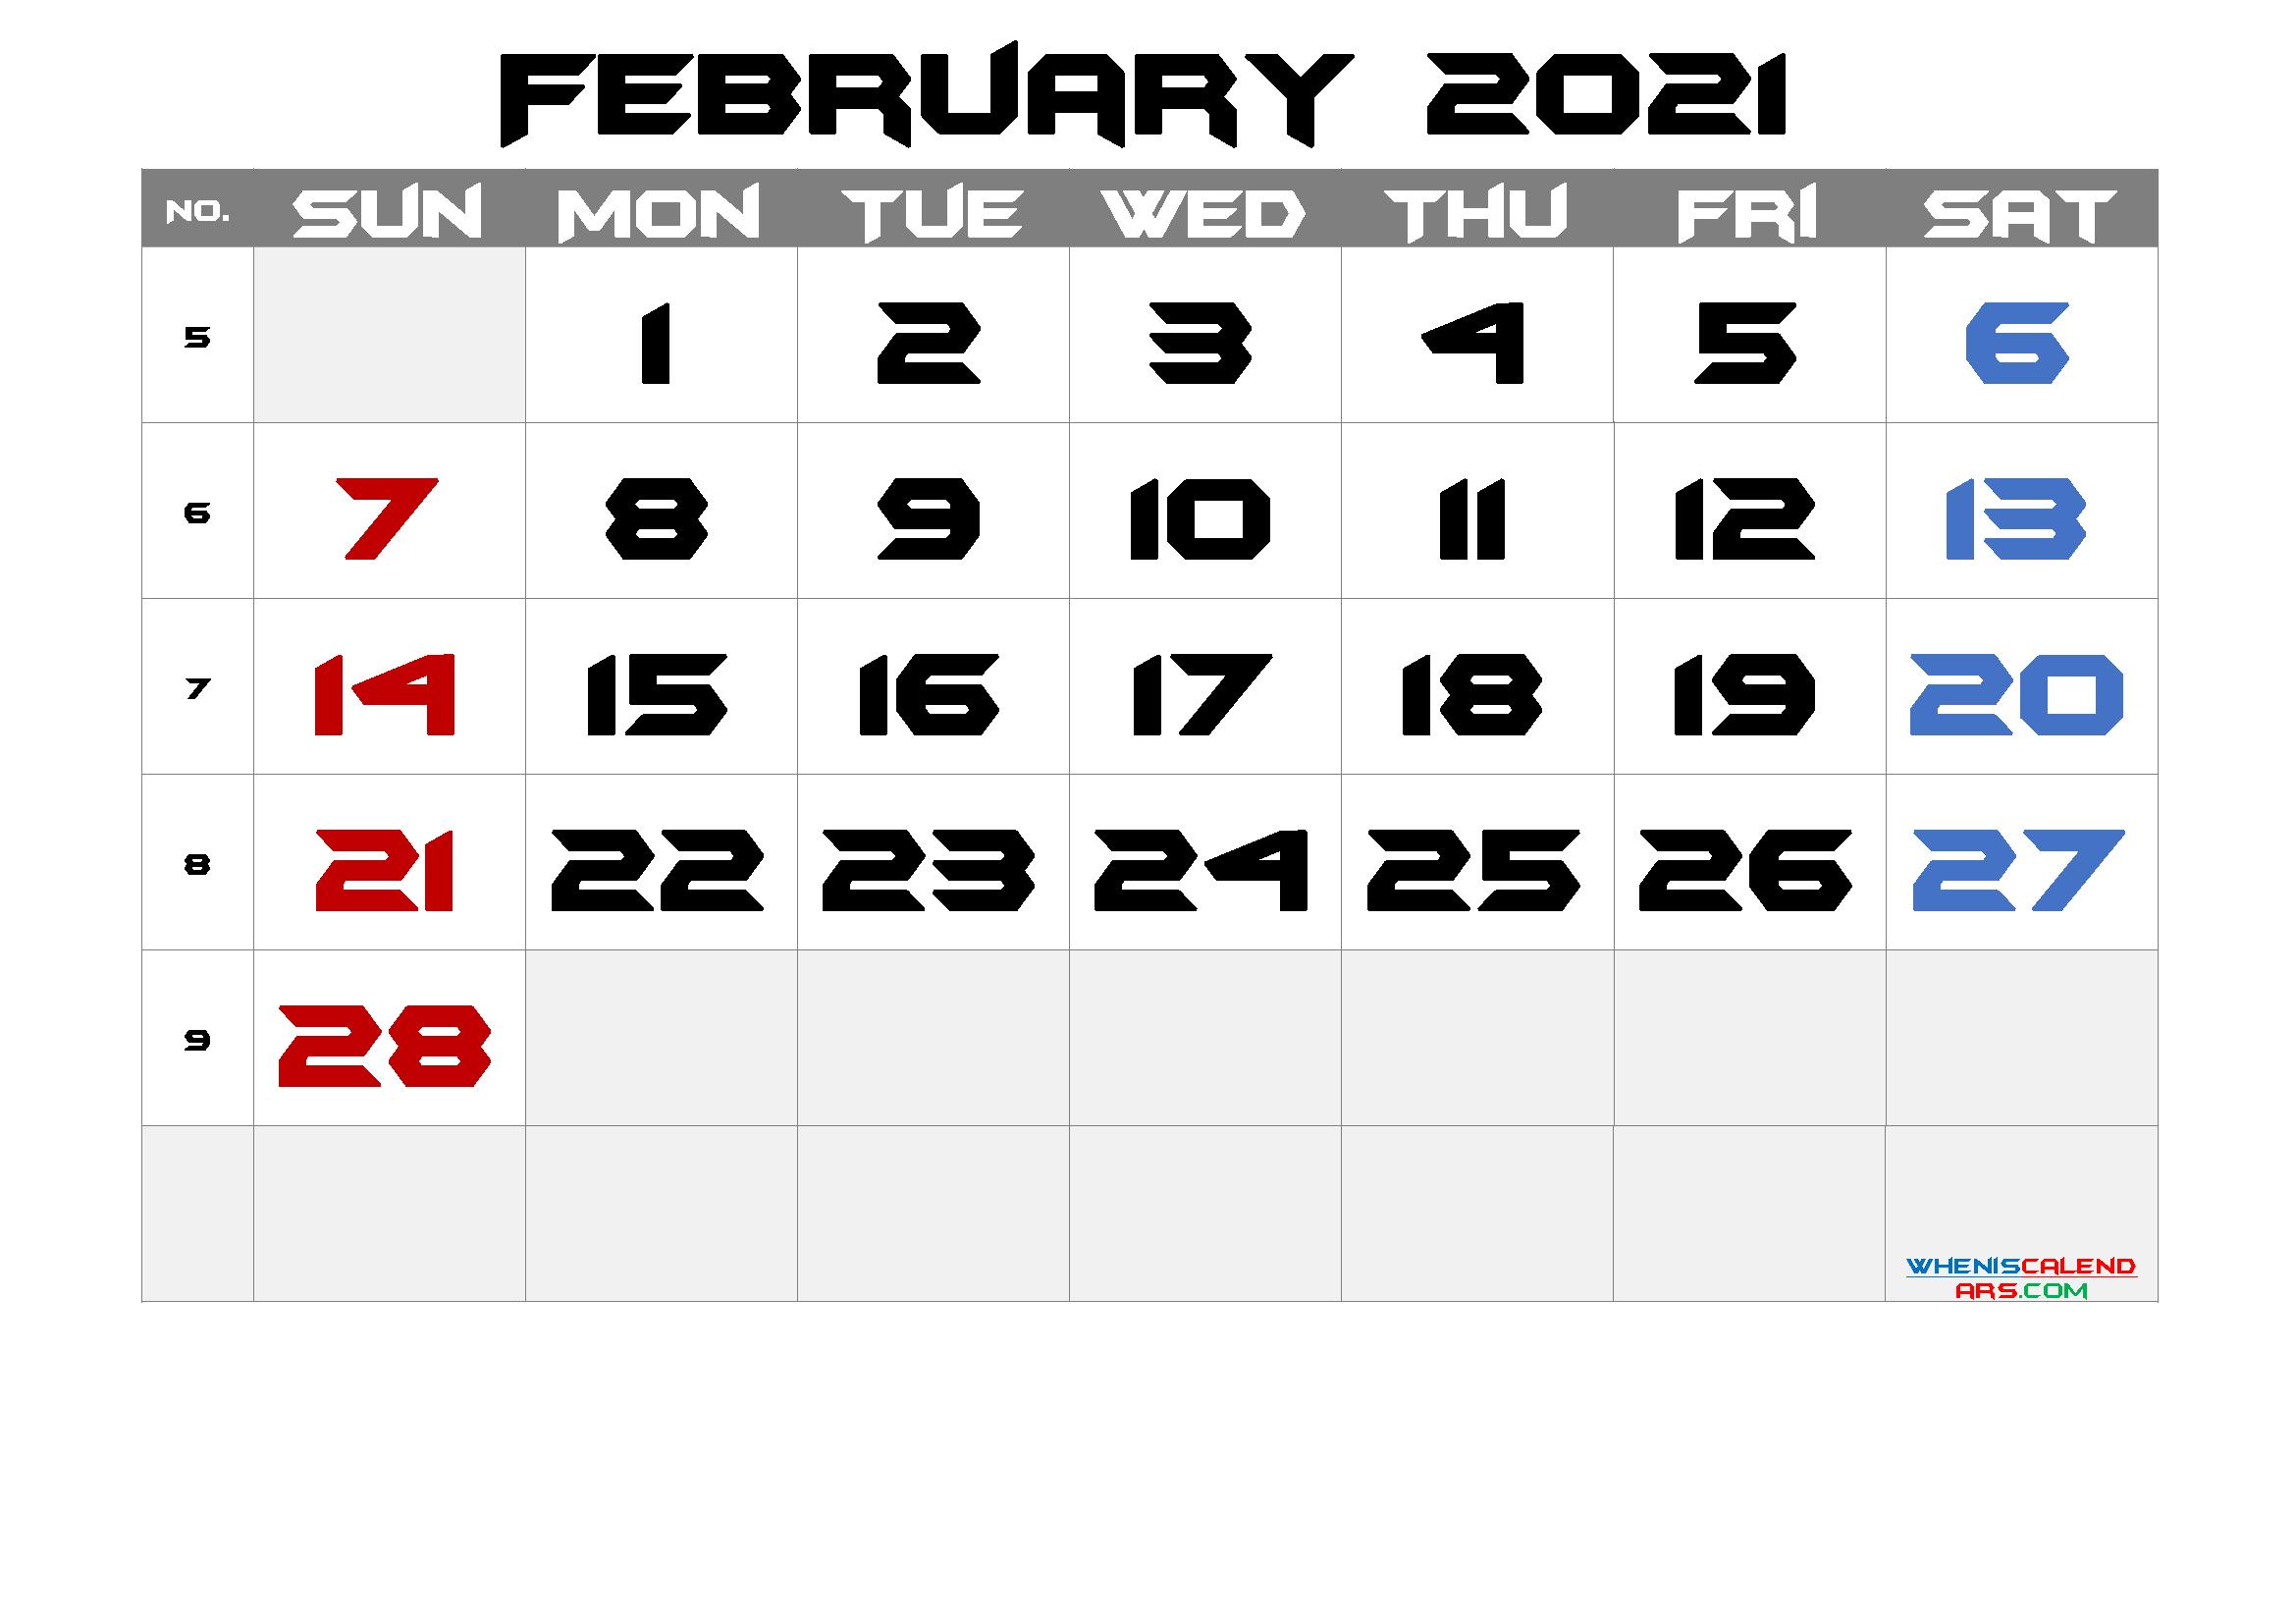 2021 February Free Printable Calendar Free Premium In 2020 Calendar With Week Numbers Calendar Printables Printable Calendar